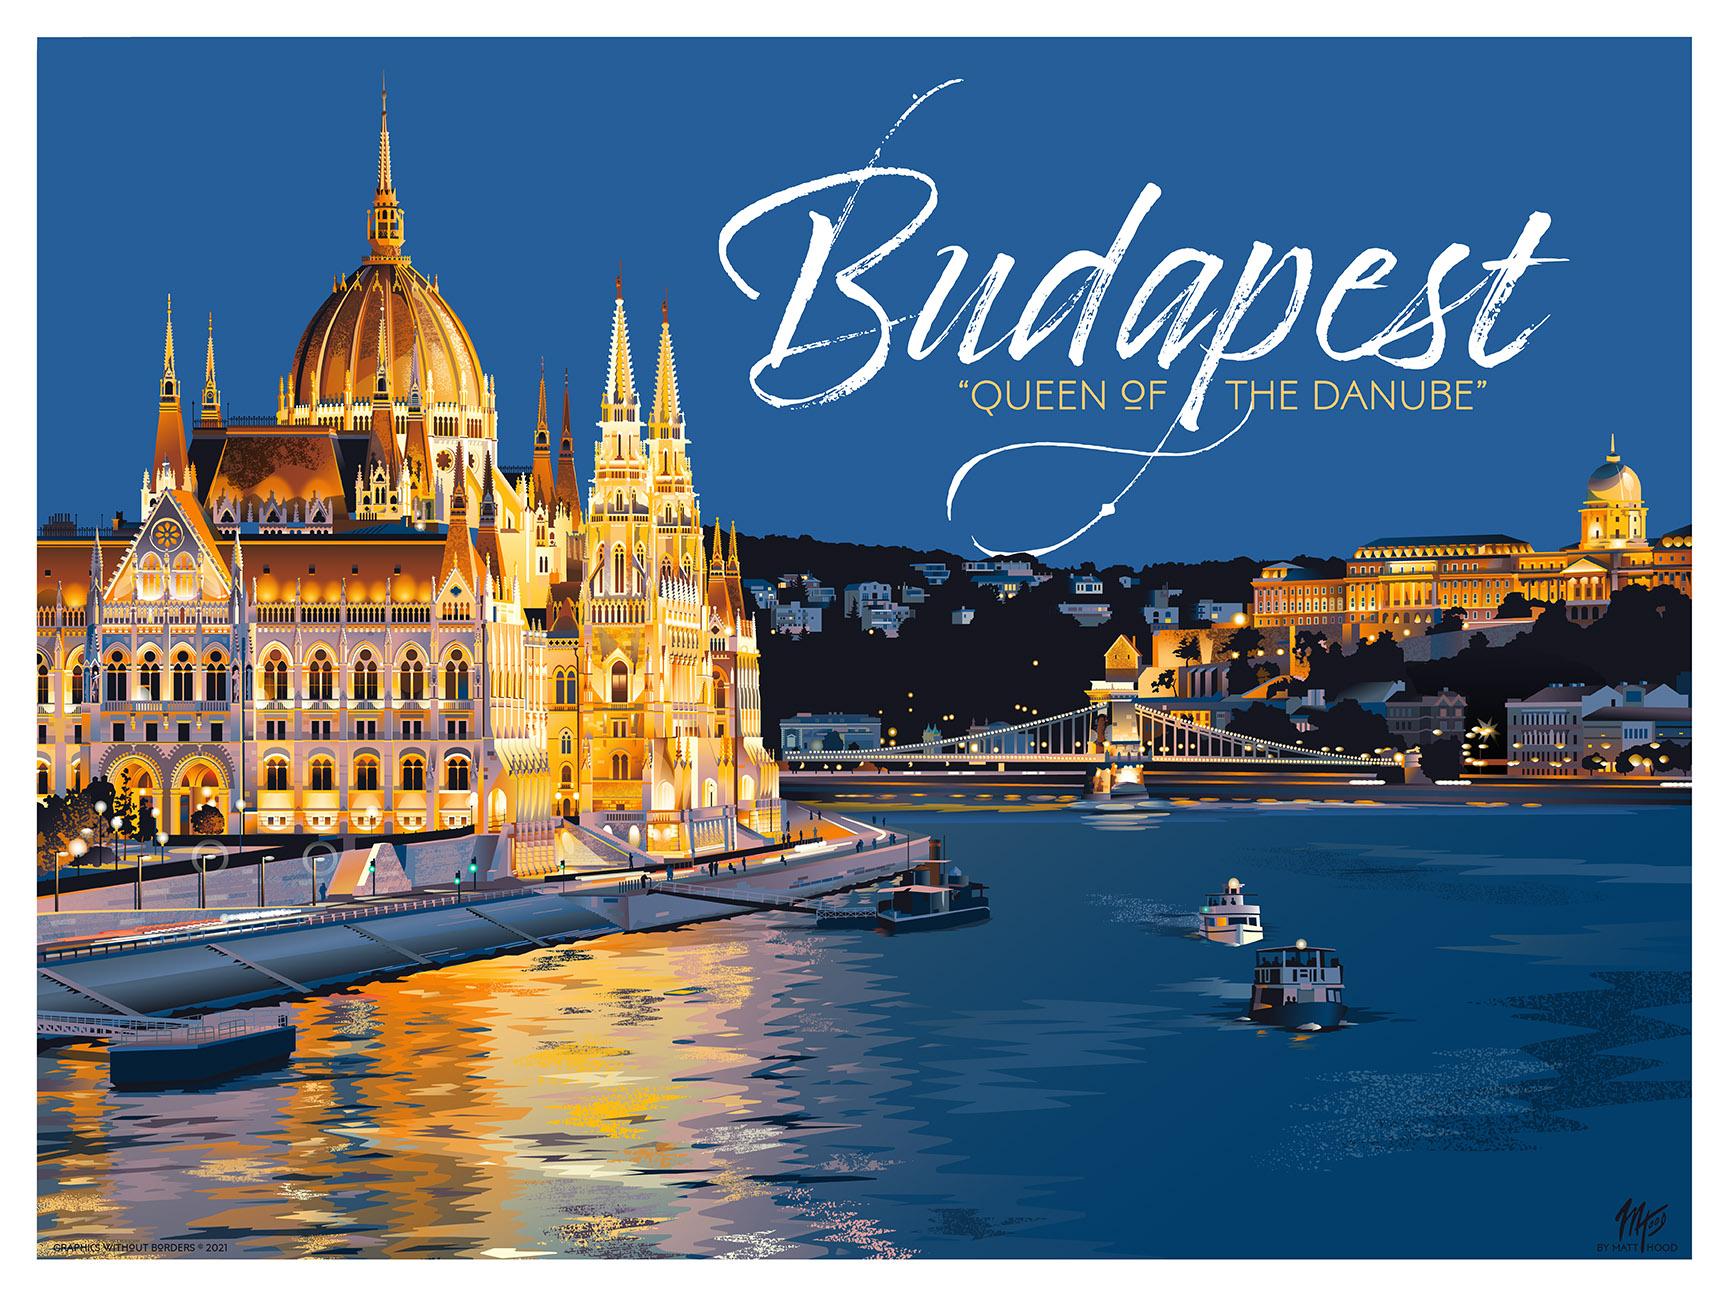 https://grfxwb.com/wp-content/uploads/2021/03/Budapest-Port.jpg